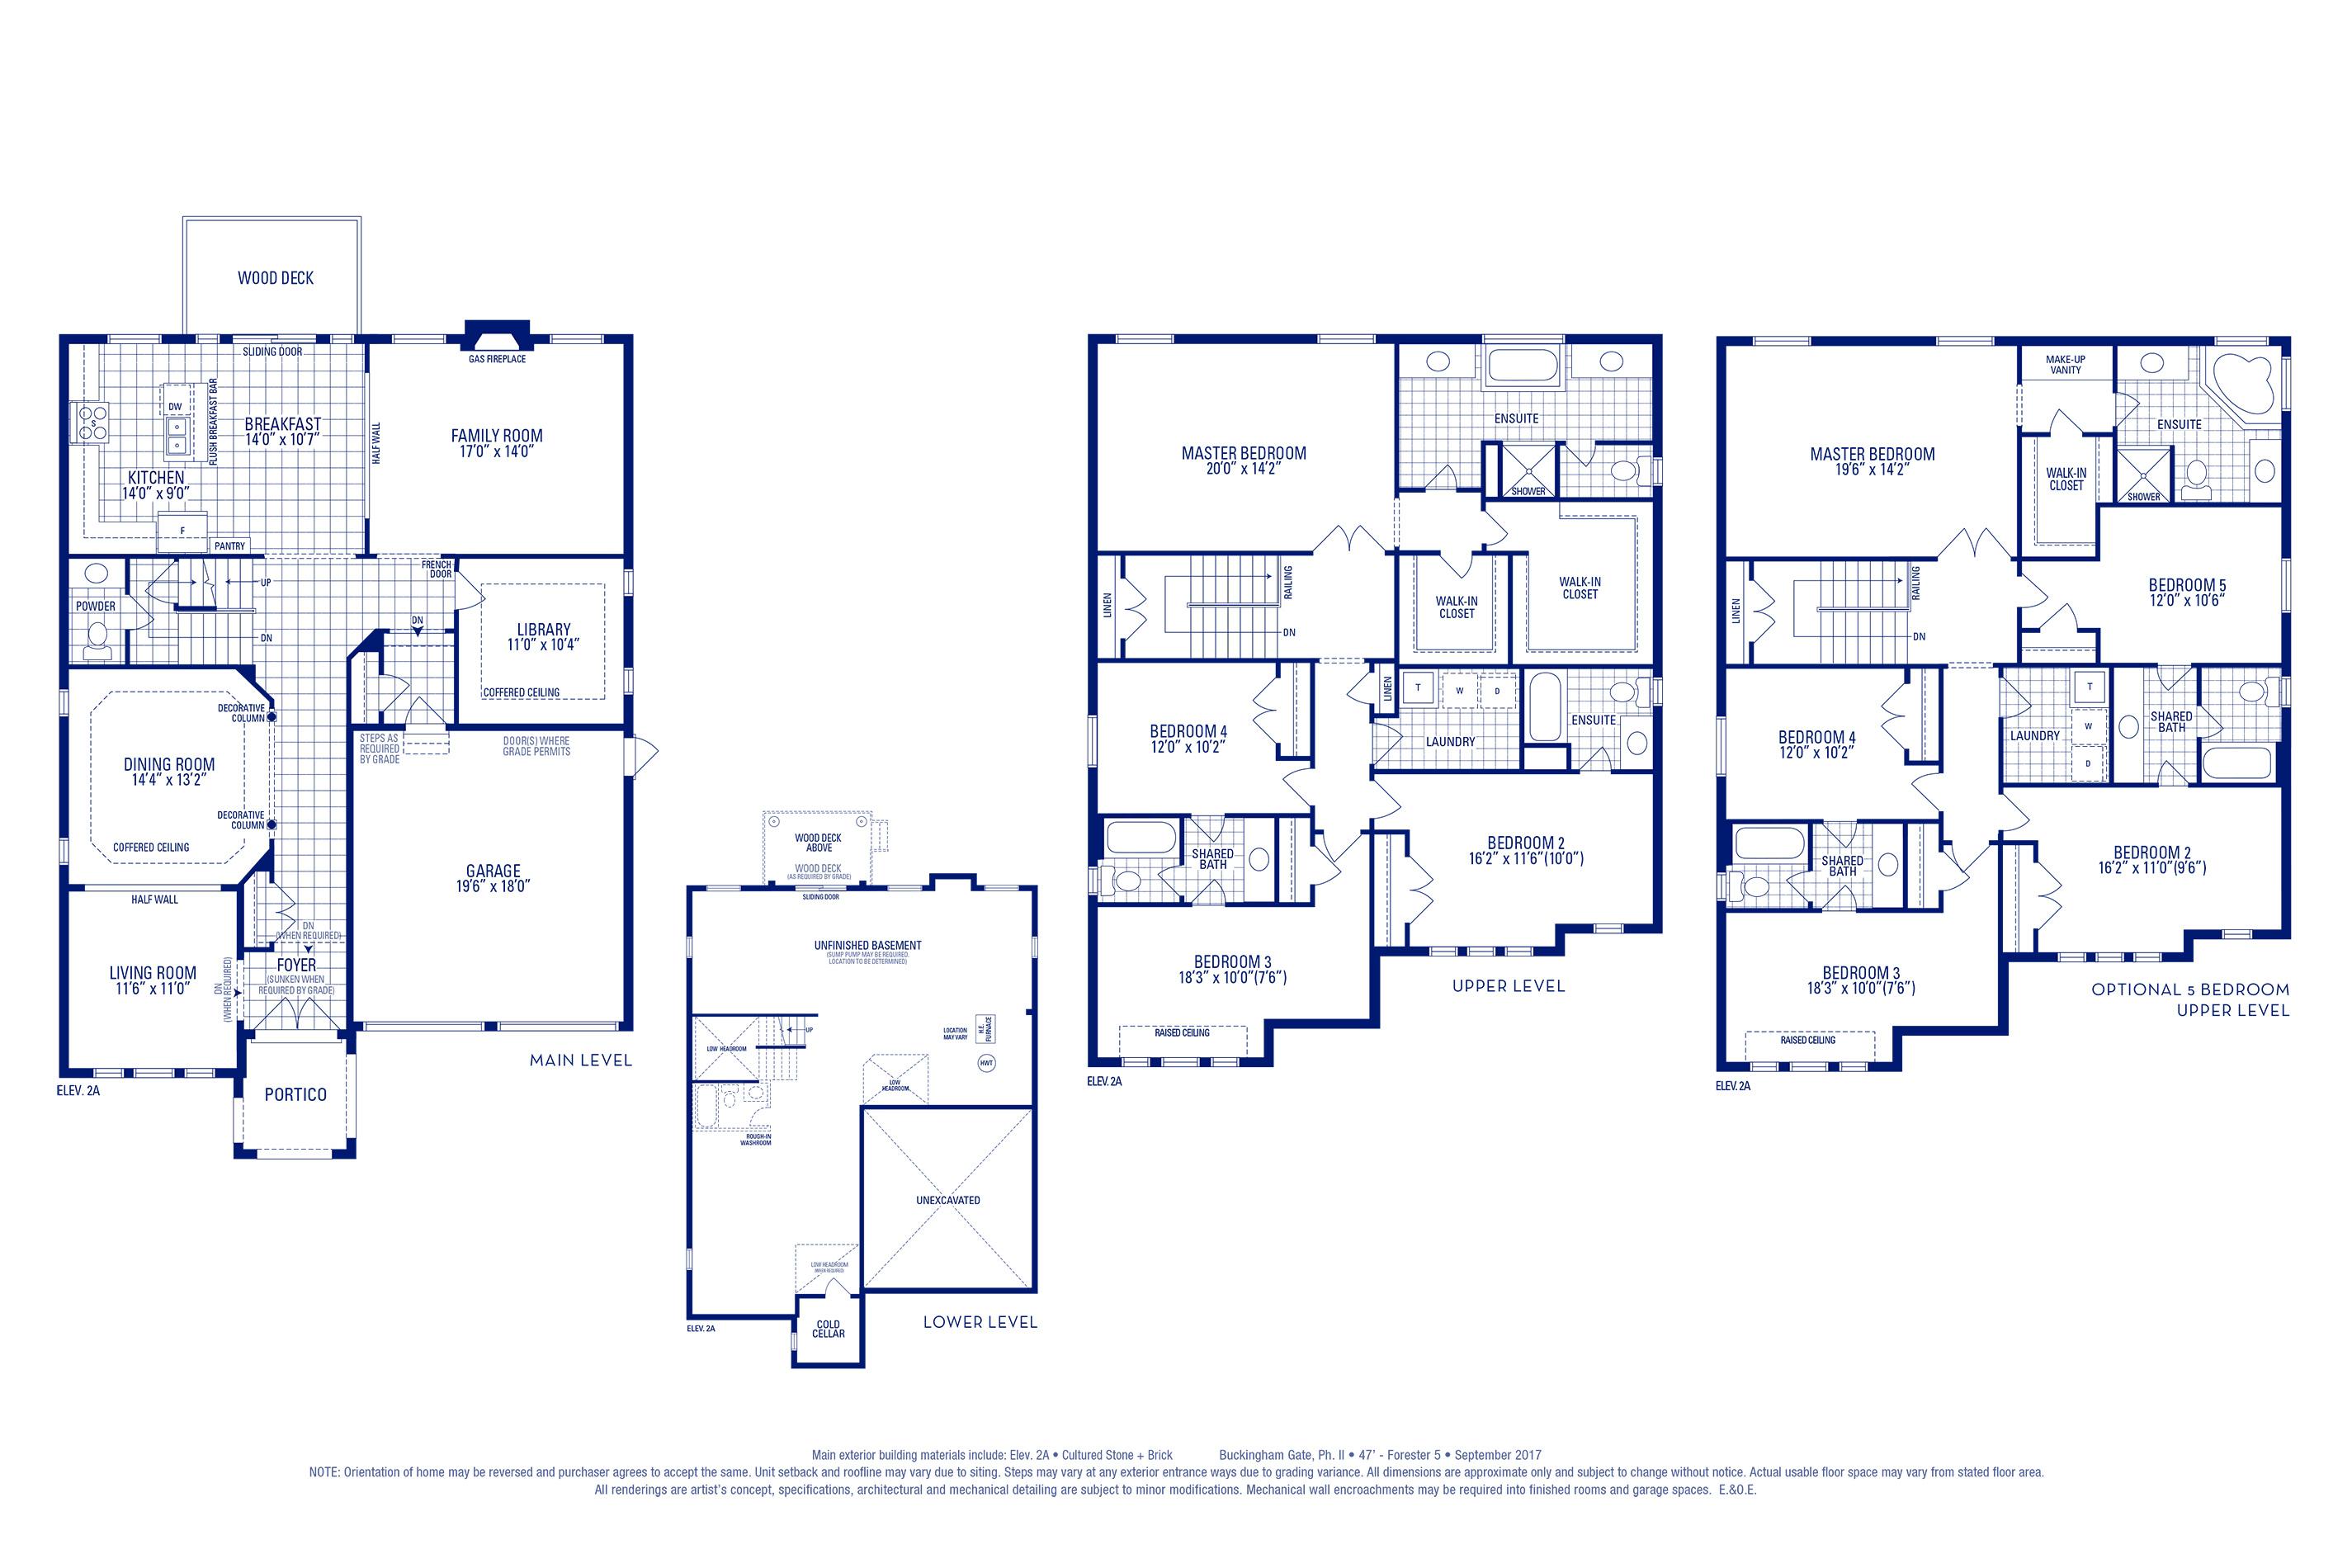 Forester 05 Elev. 2A Floorplan Thumbnail